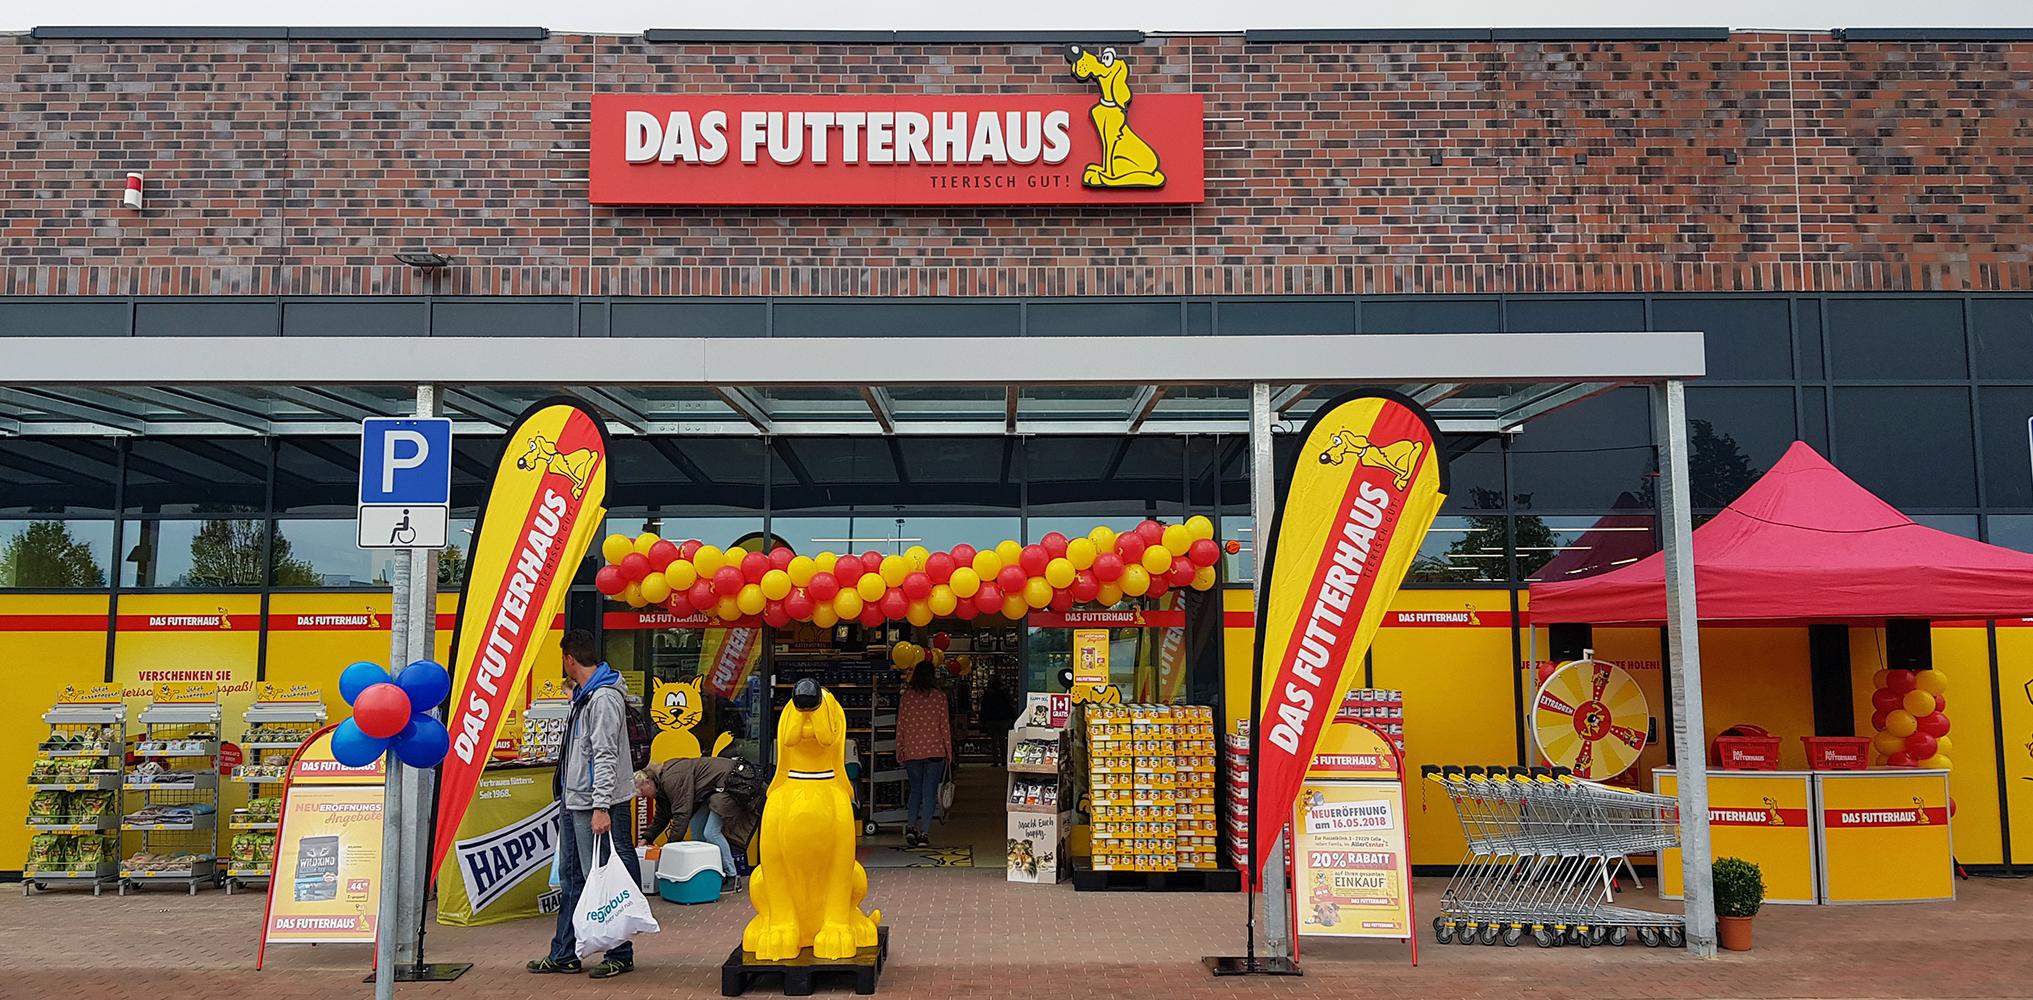 DAS FUTTERHAUS - Celle (AllerCenter)